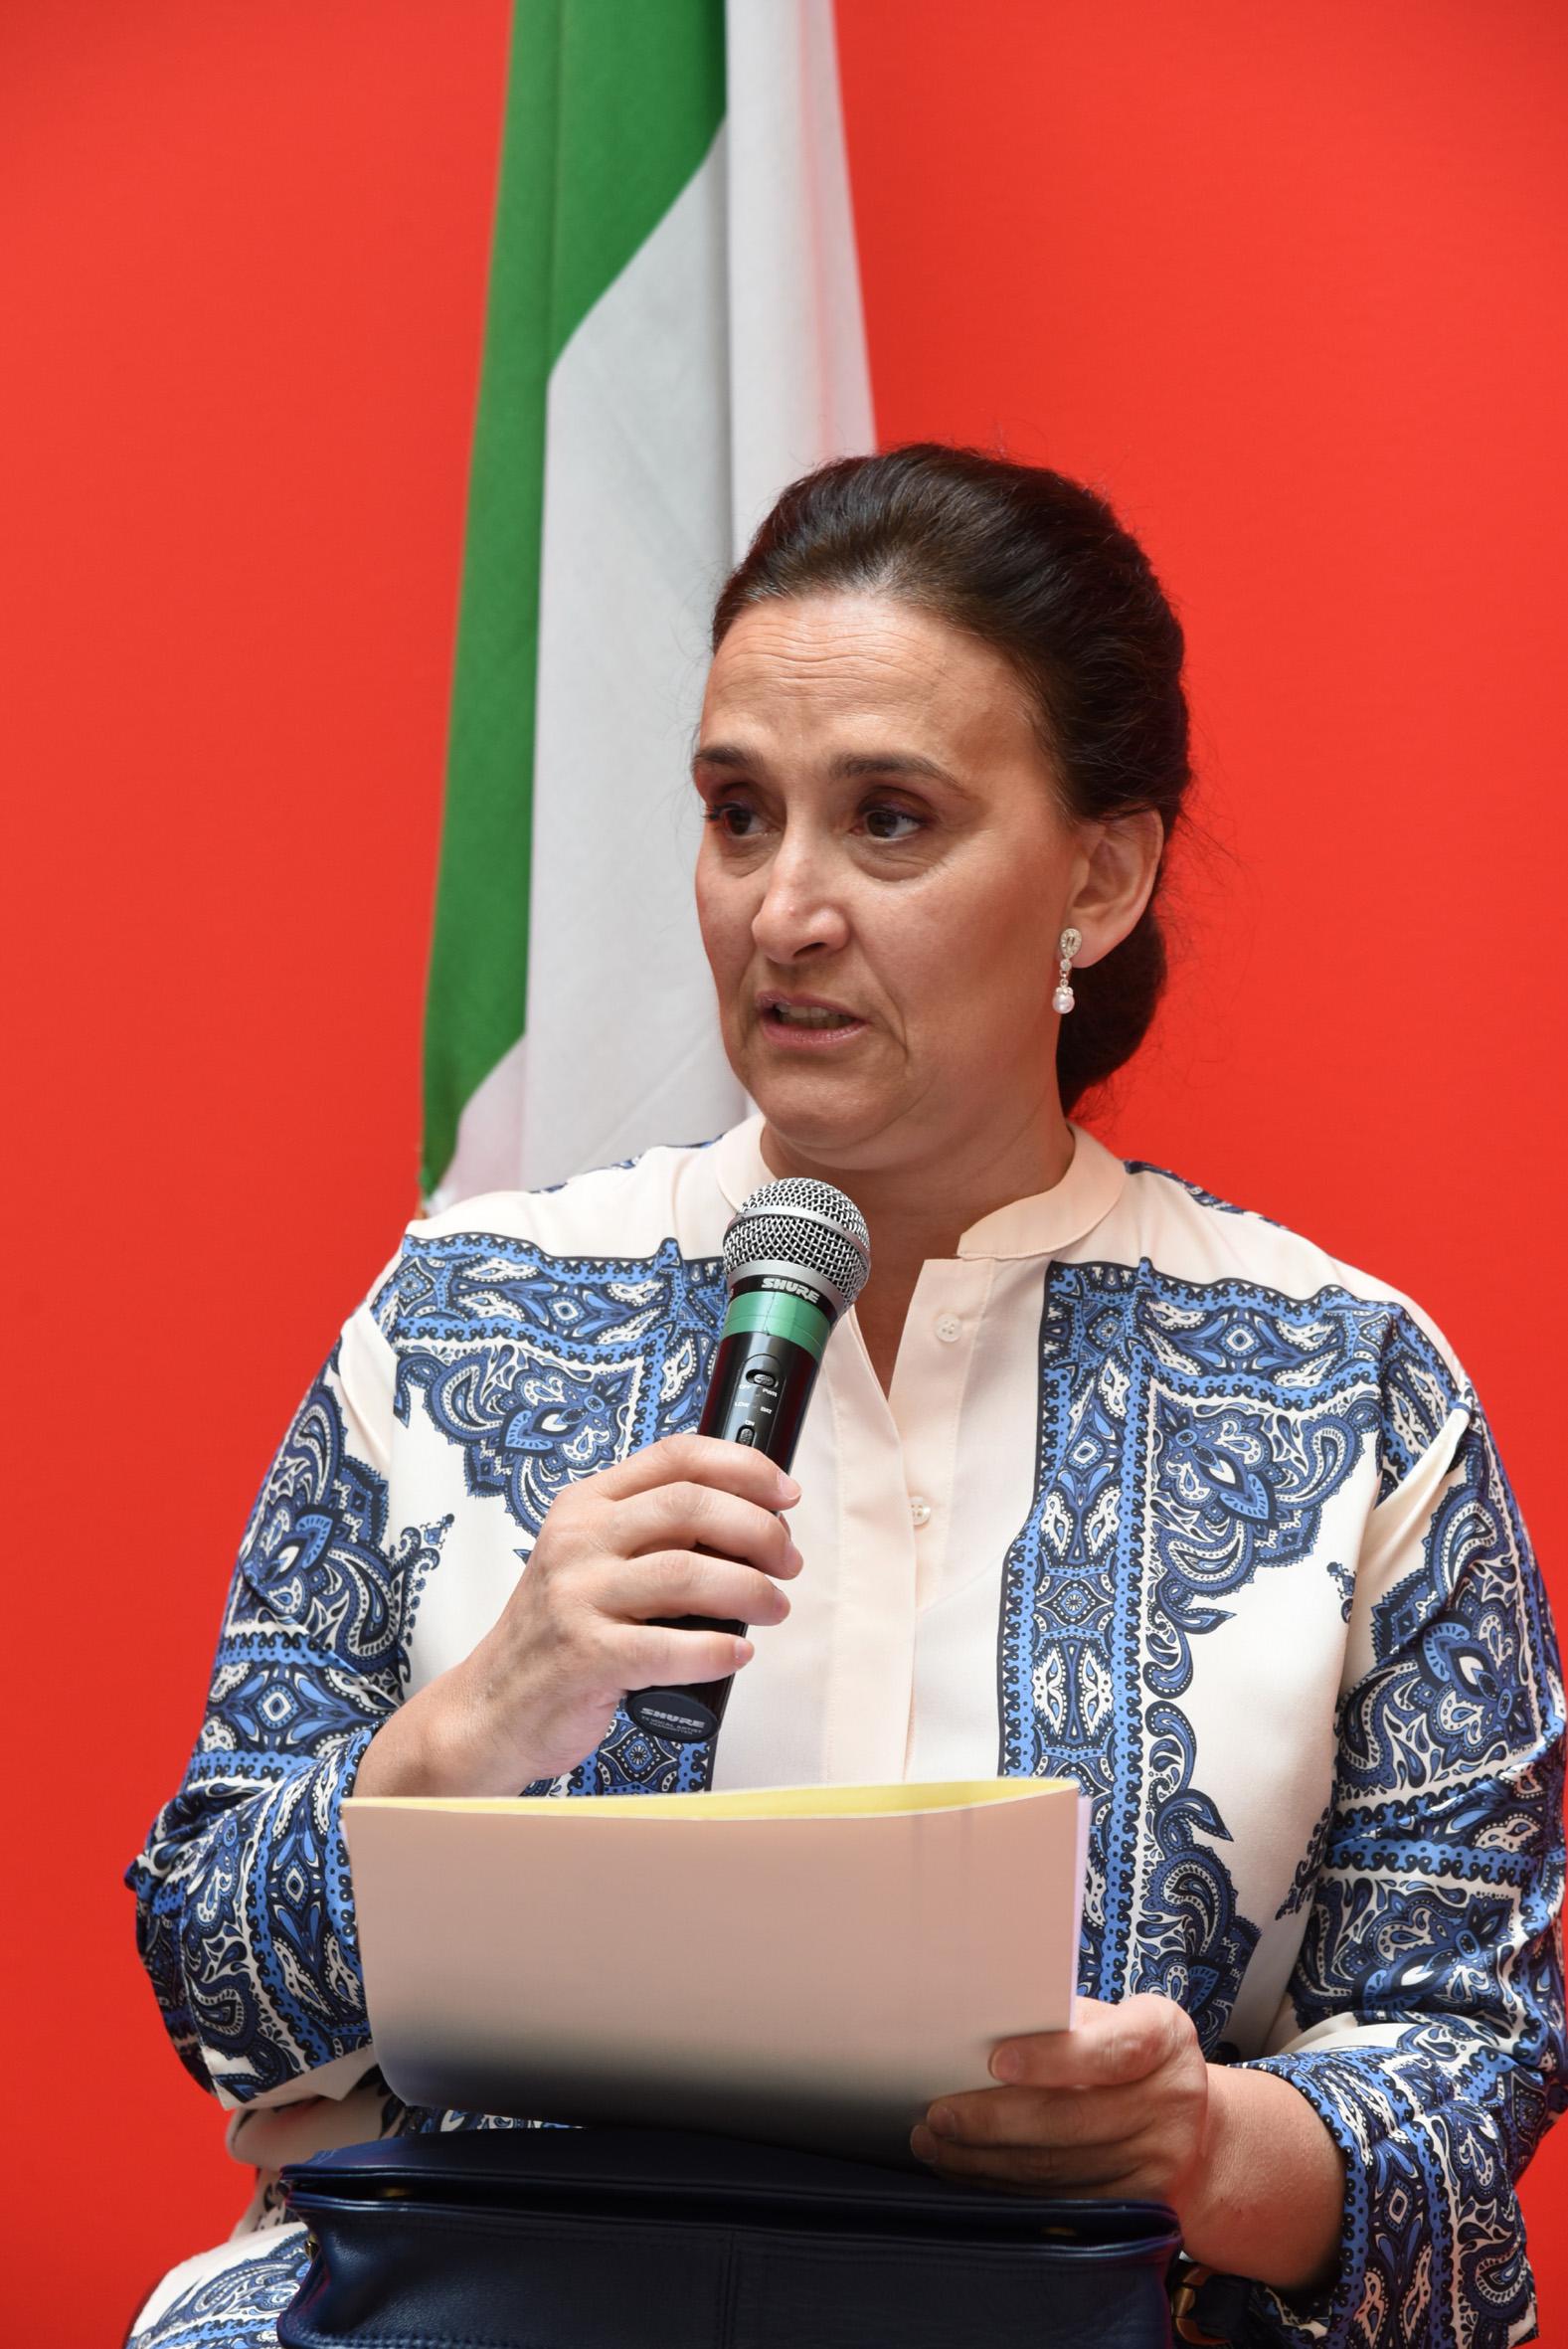 VPresiente Michetti